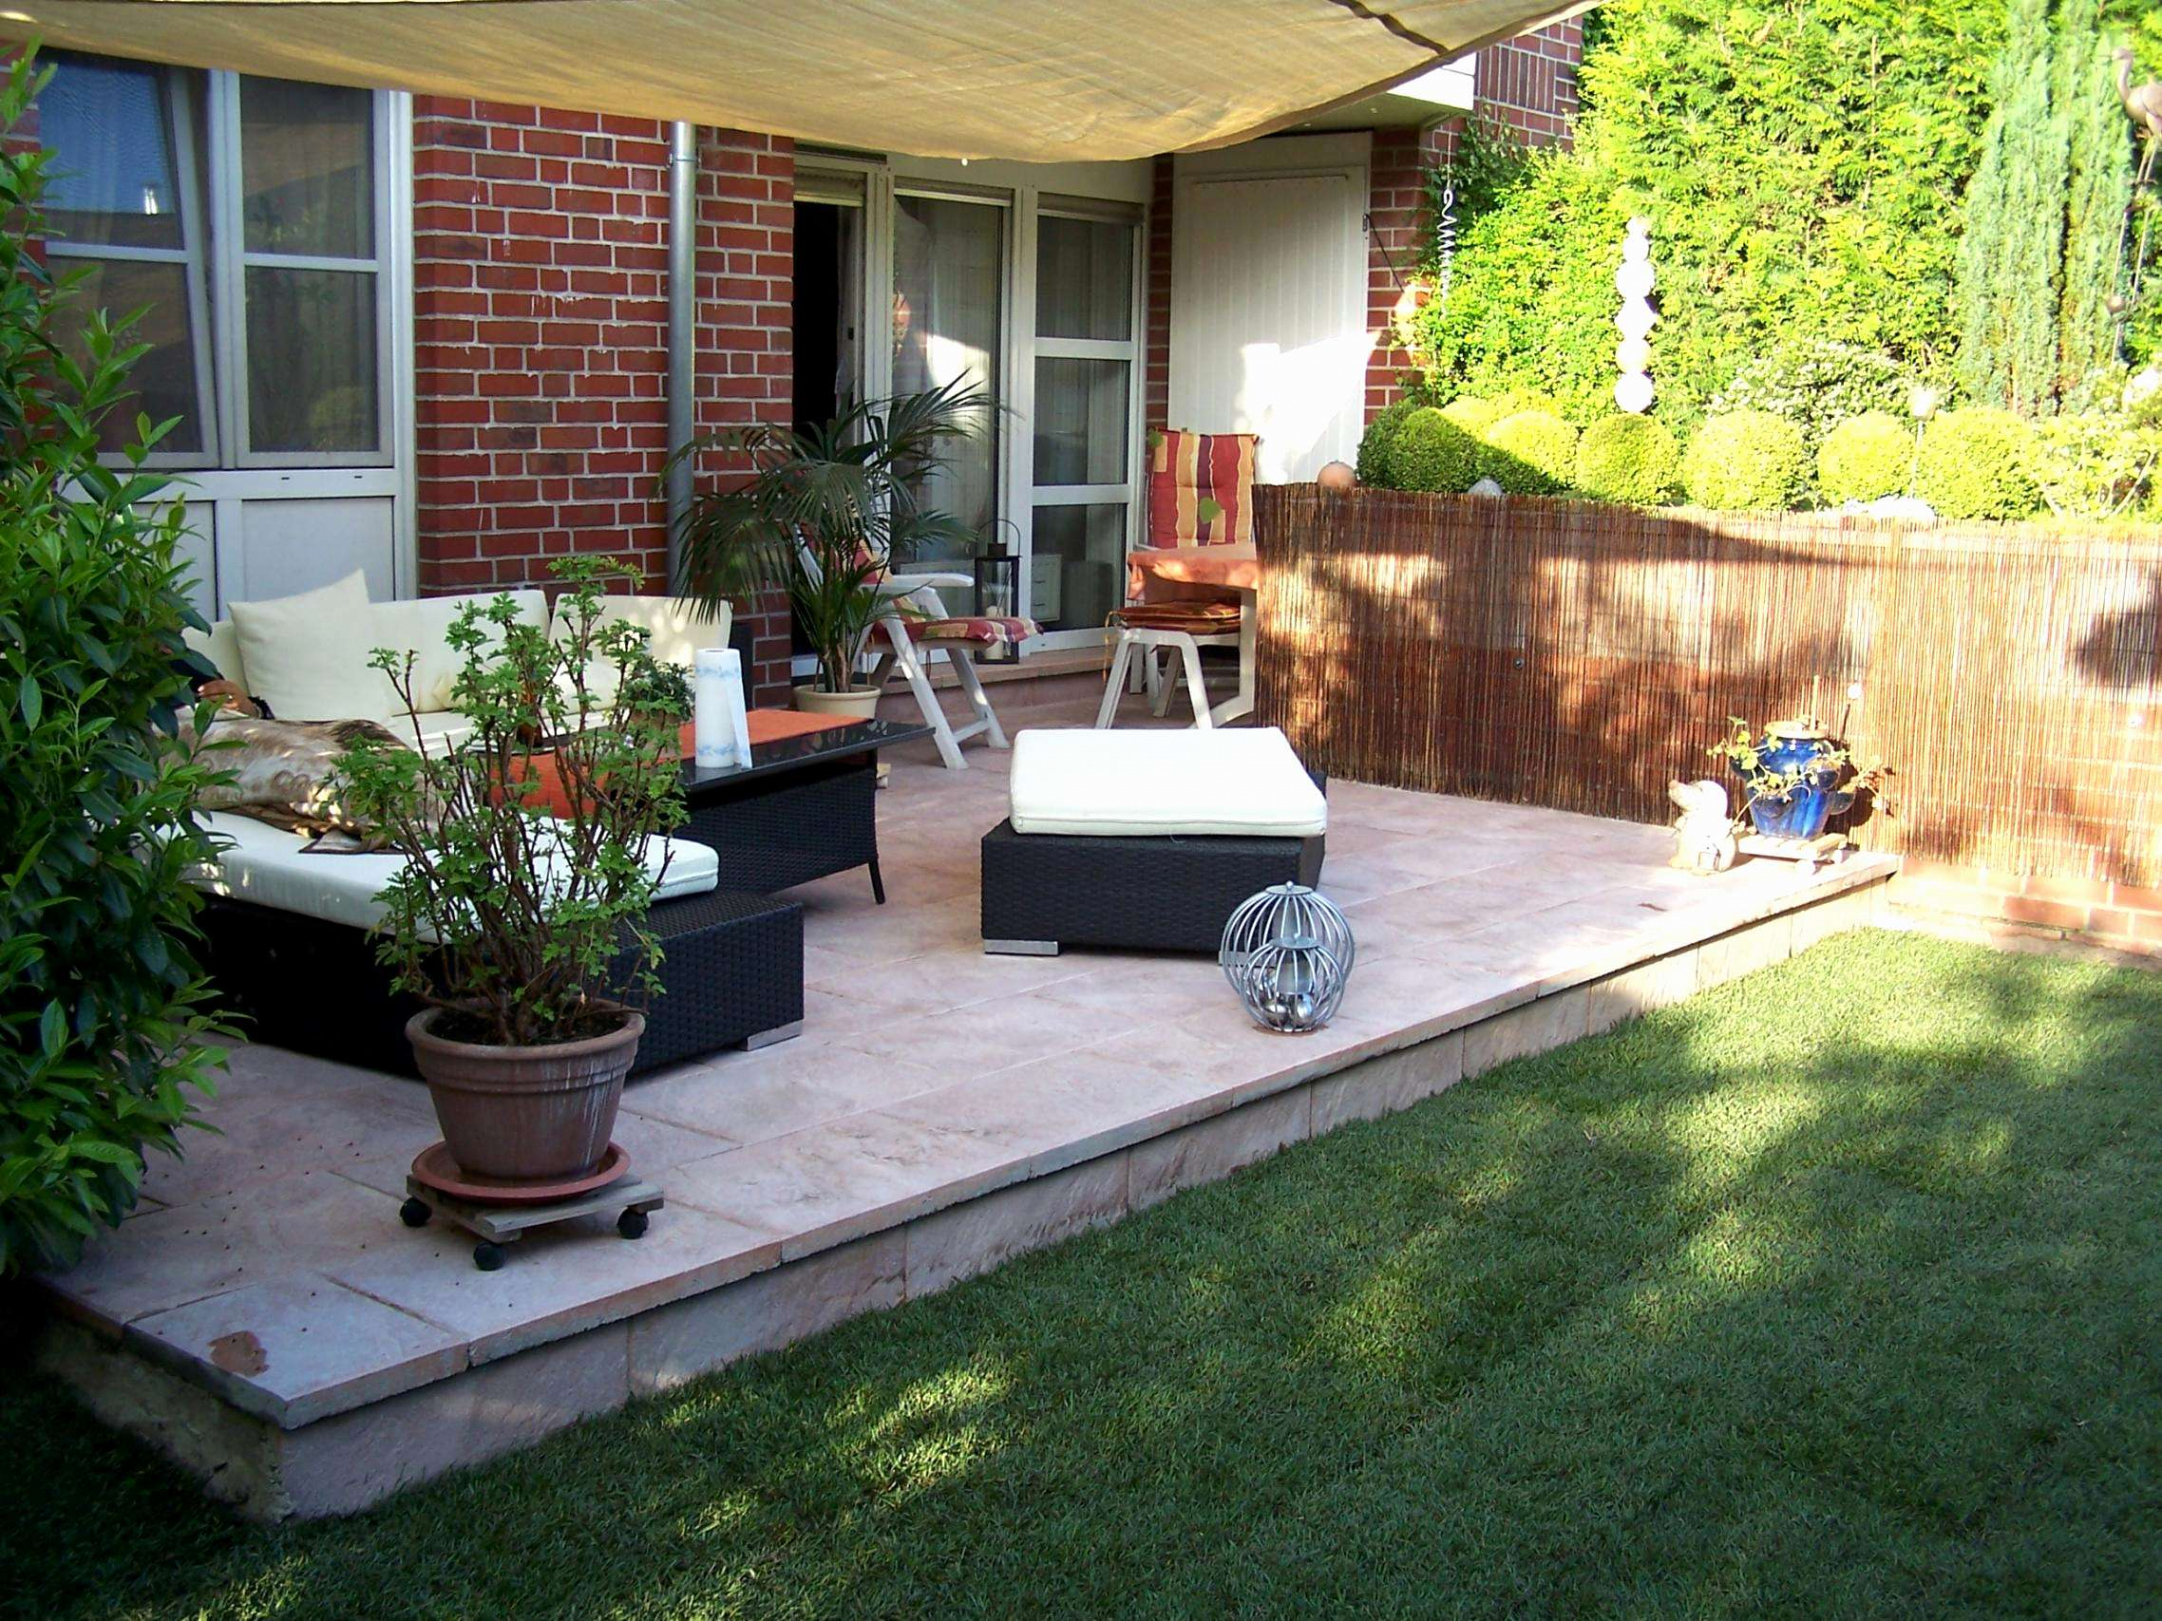 40 Einzigartig Garten Ideen Gestaltung Garten Deko